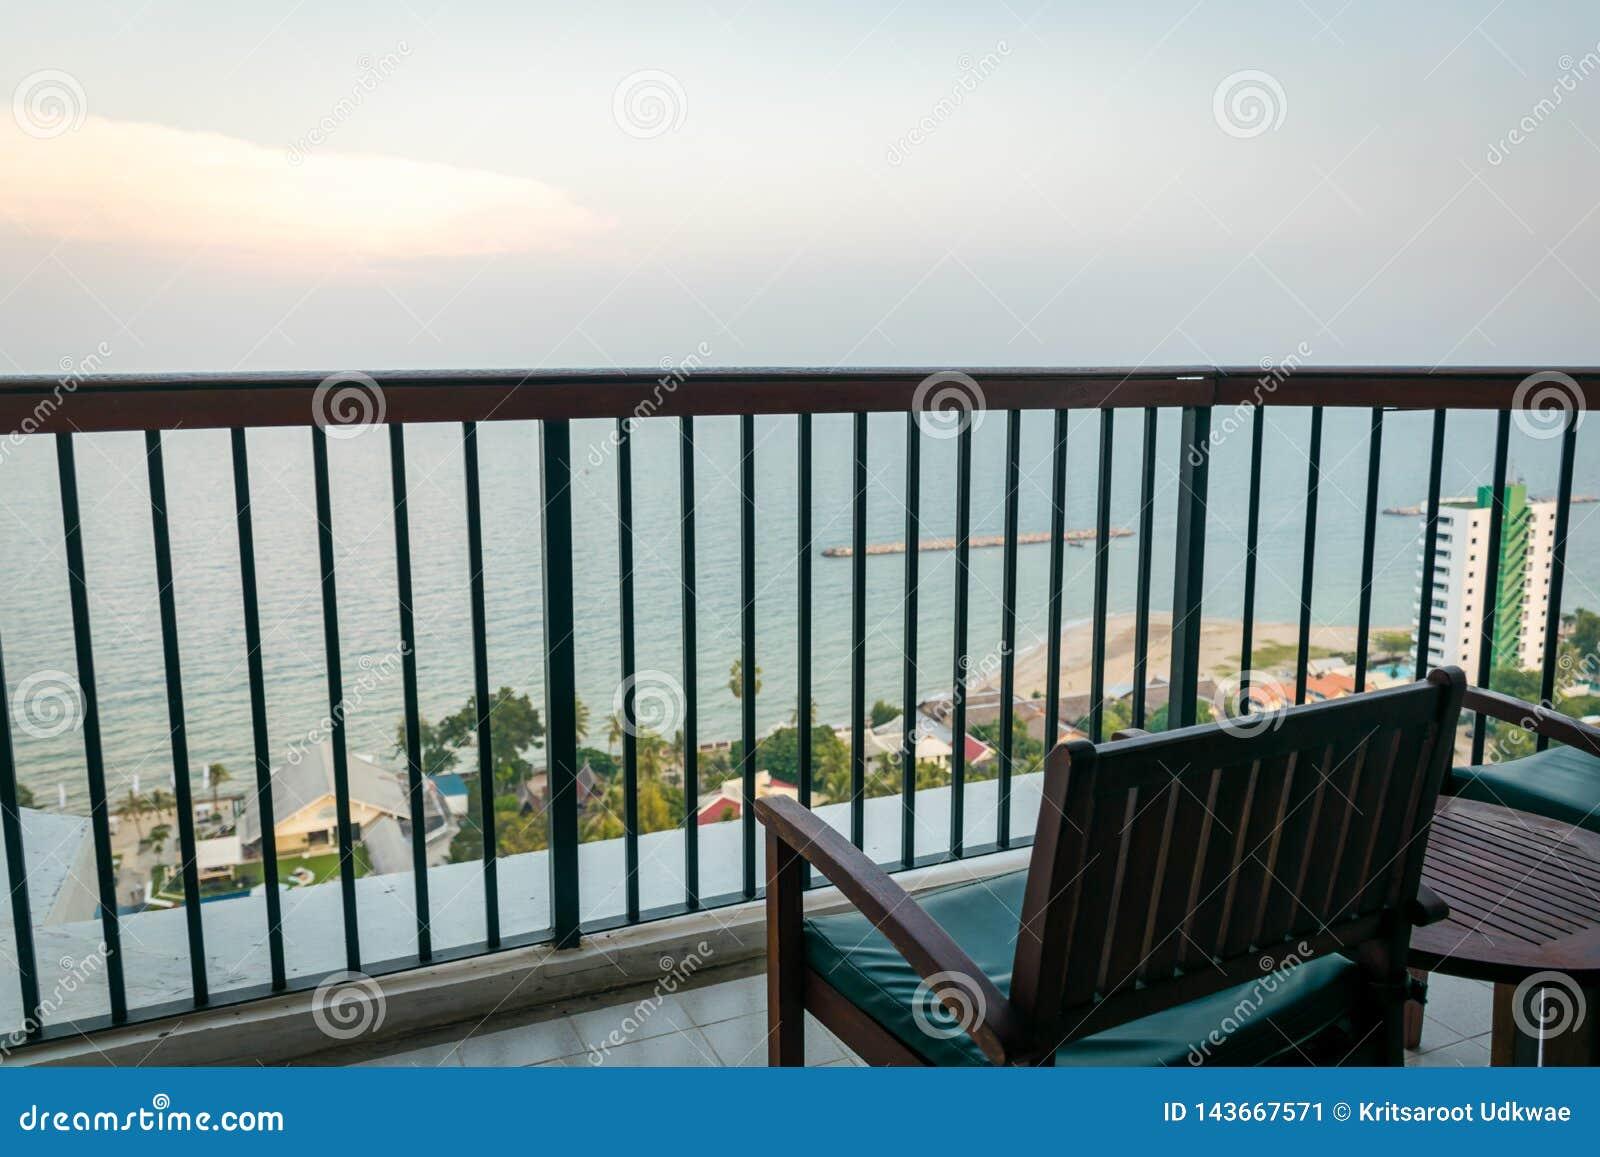 Balcony view to see a sea and sky at Hua-Hin, Thailand.